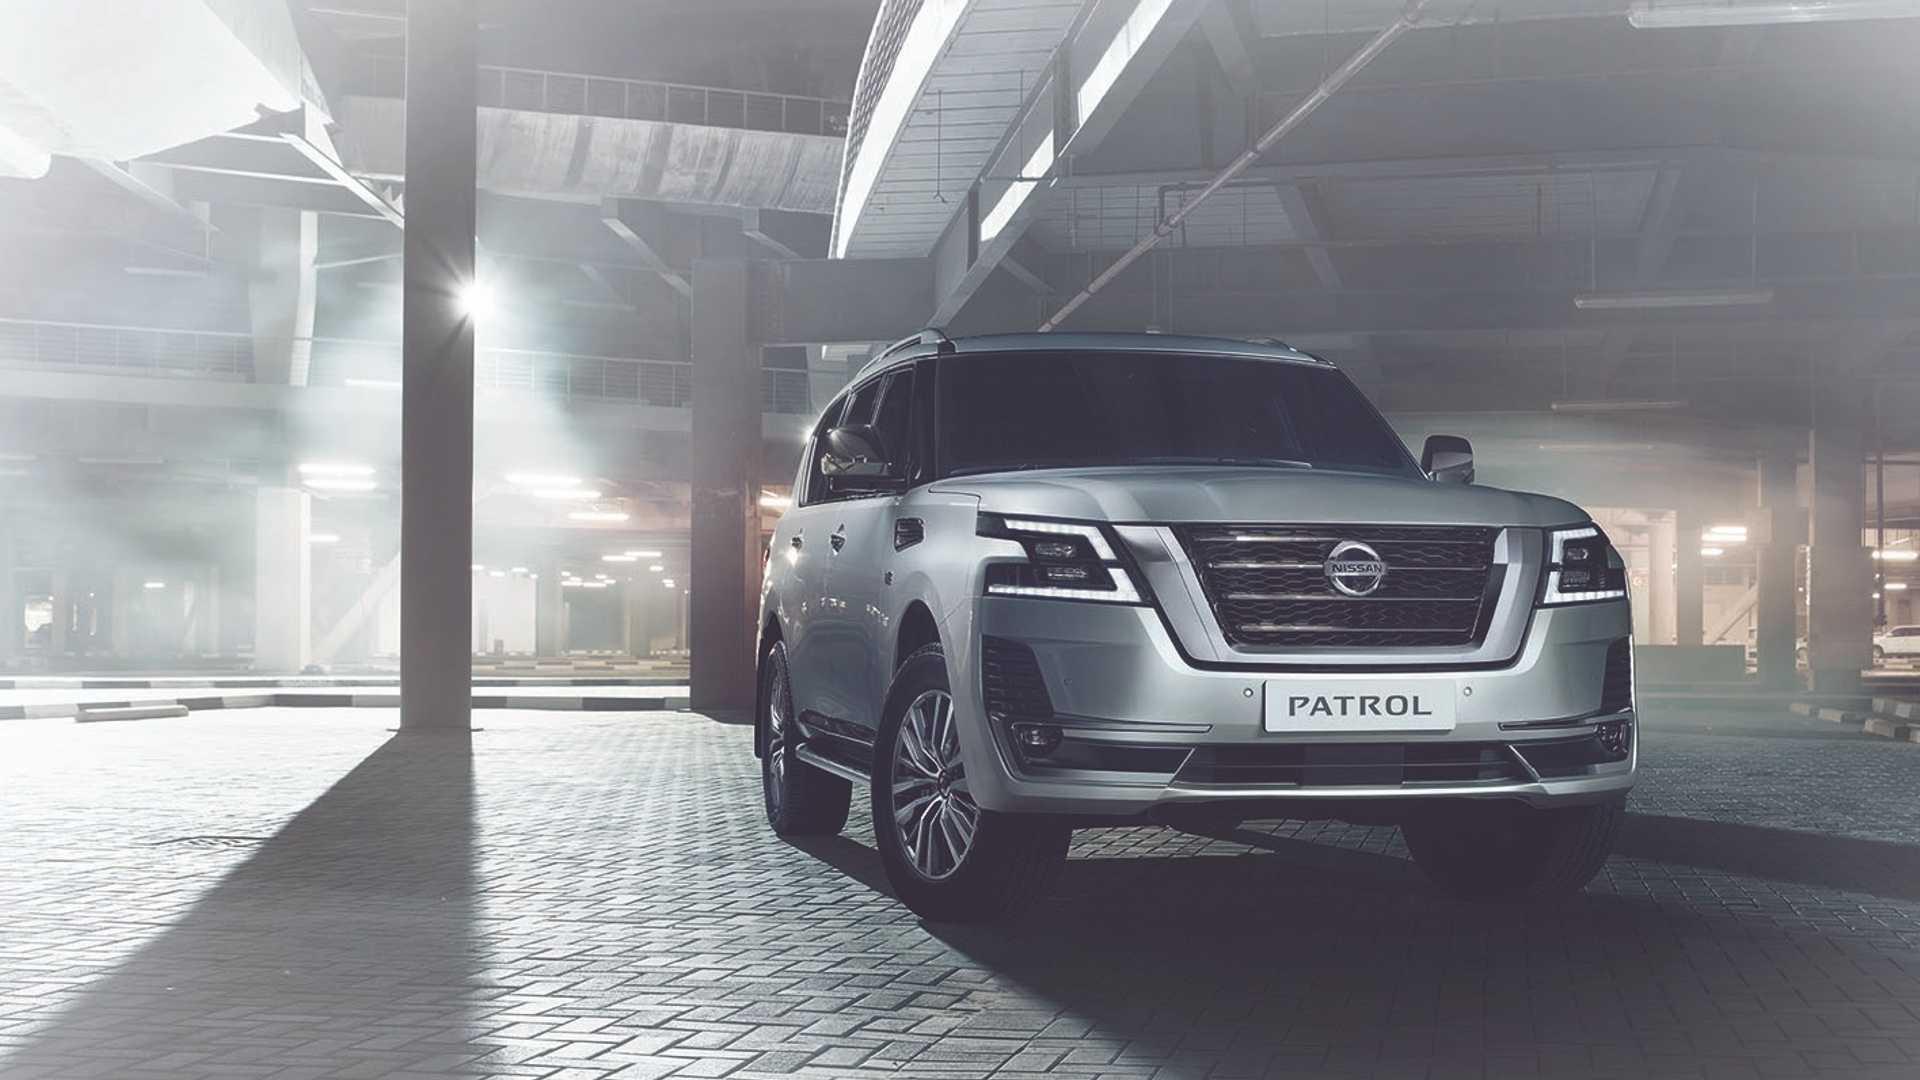 2020 Nissan Patrol History